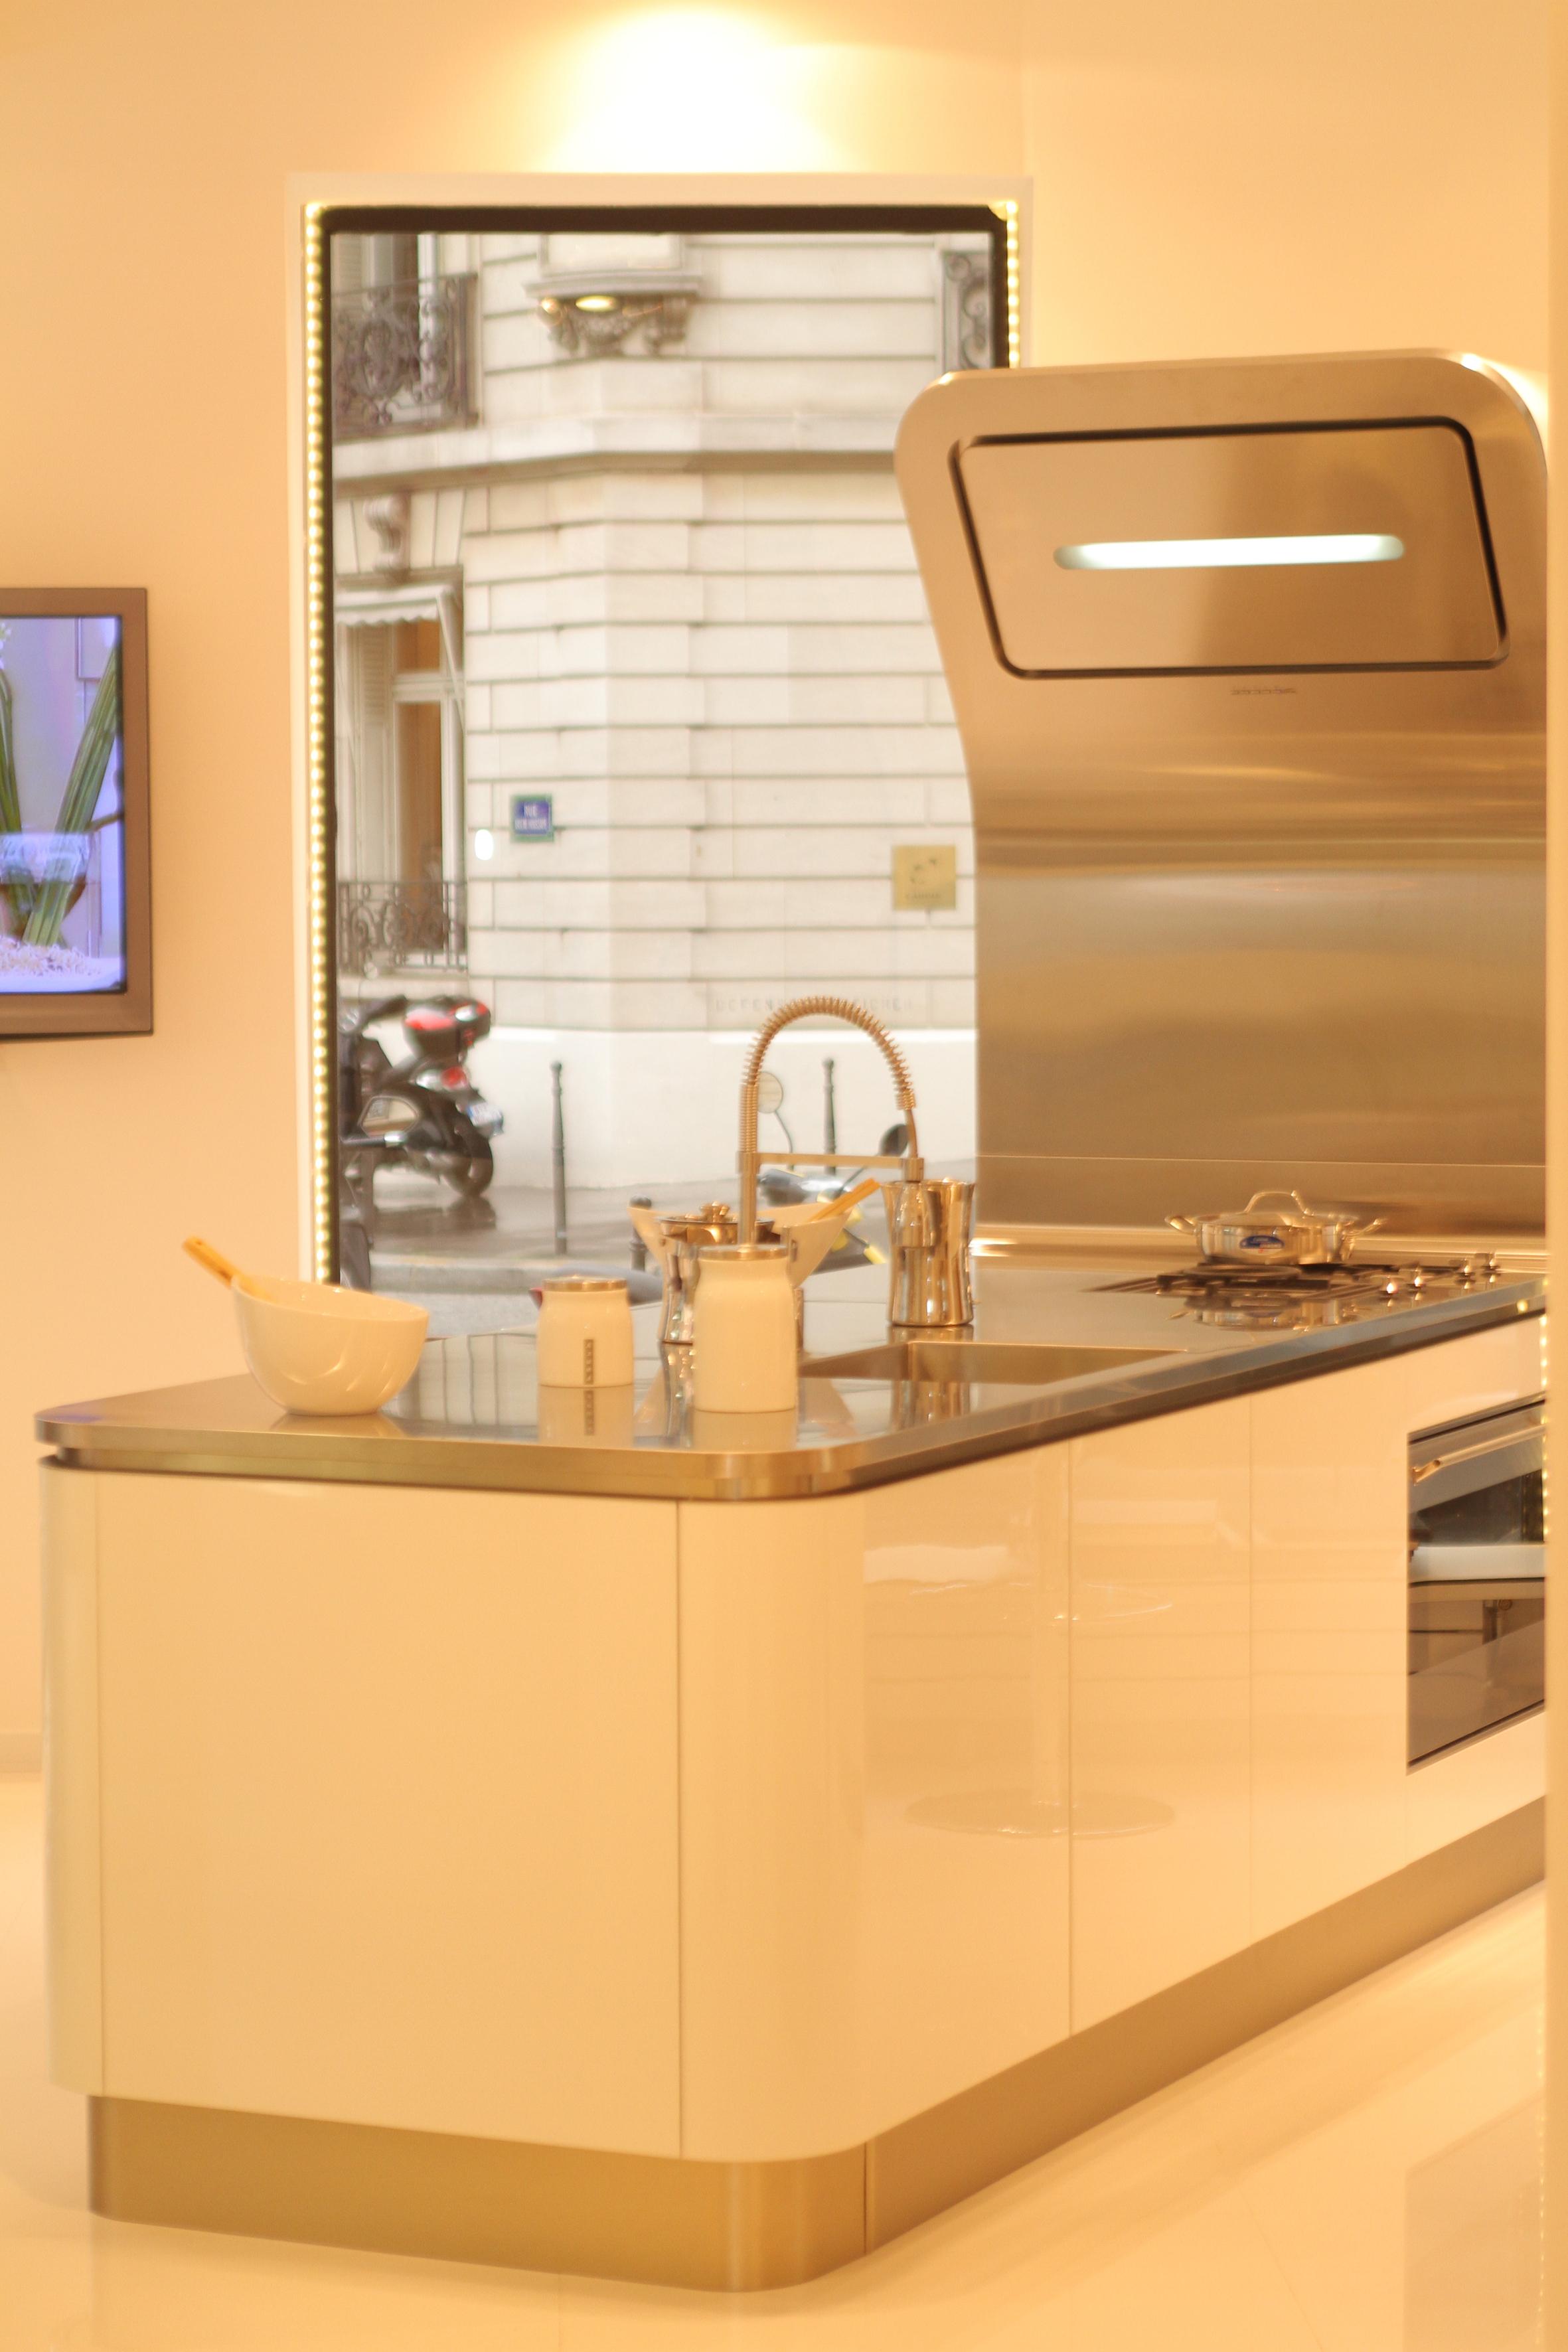 free photo cuisine compacte with cuisine compacte. Black Bedroom Furniture Sets. Home Design Ideas